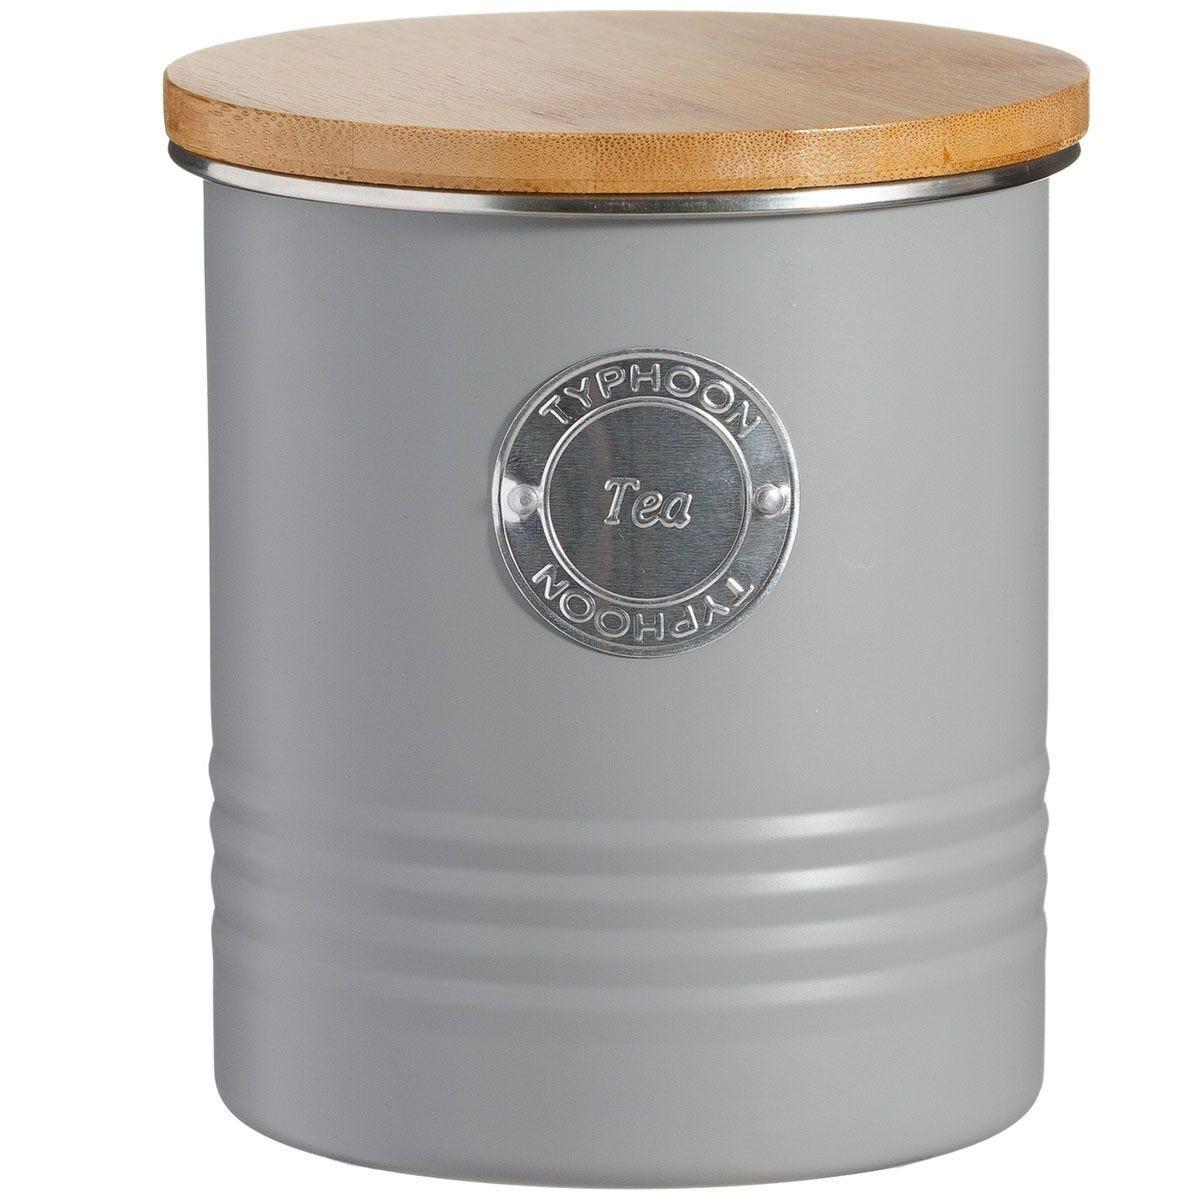 Typhoon Living Tea Storage Canister - Grey